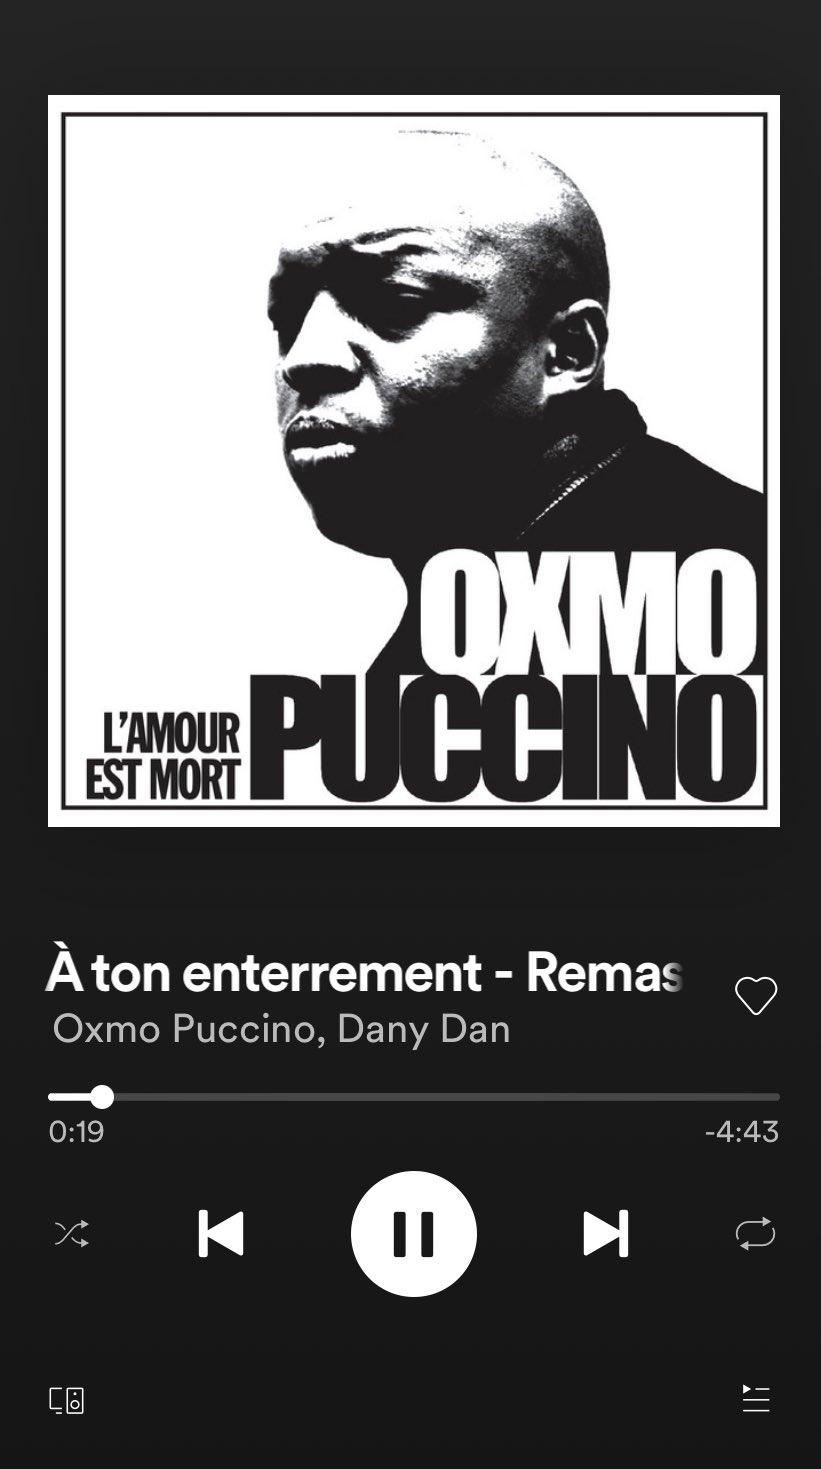 L Amour Est Mort Oxmo : amour, Sindanu, Twitter:,